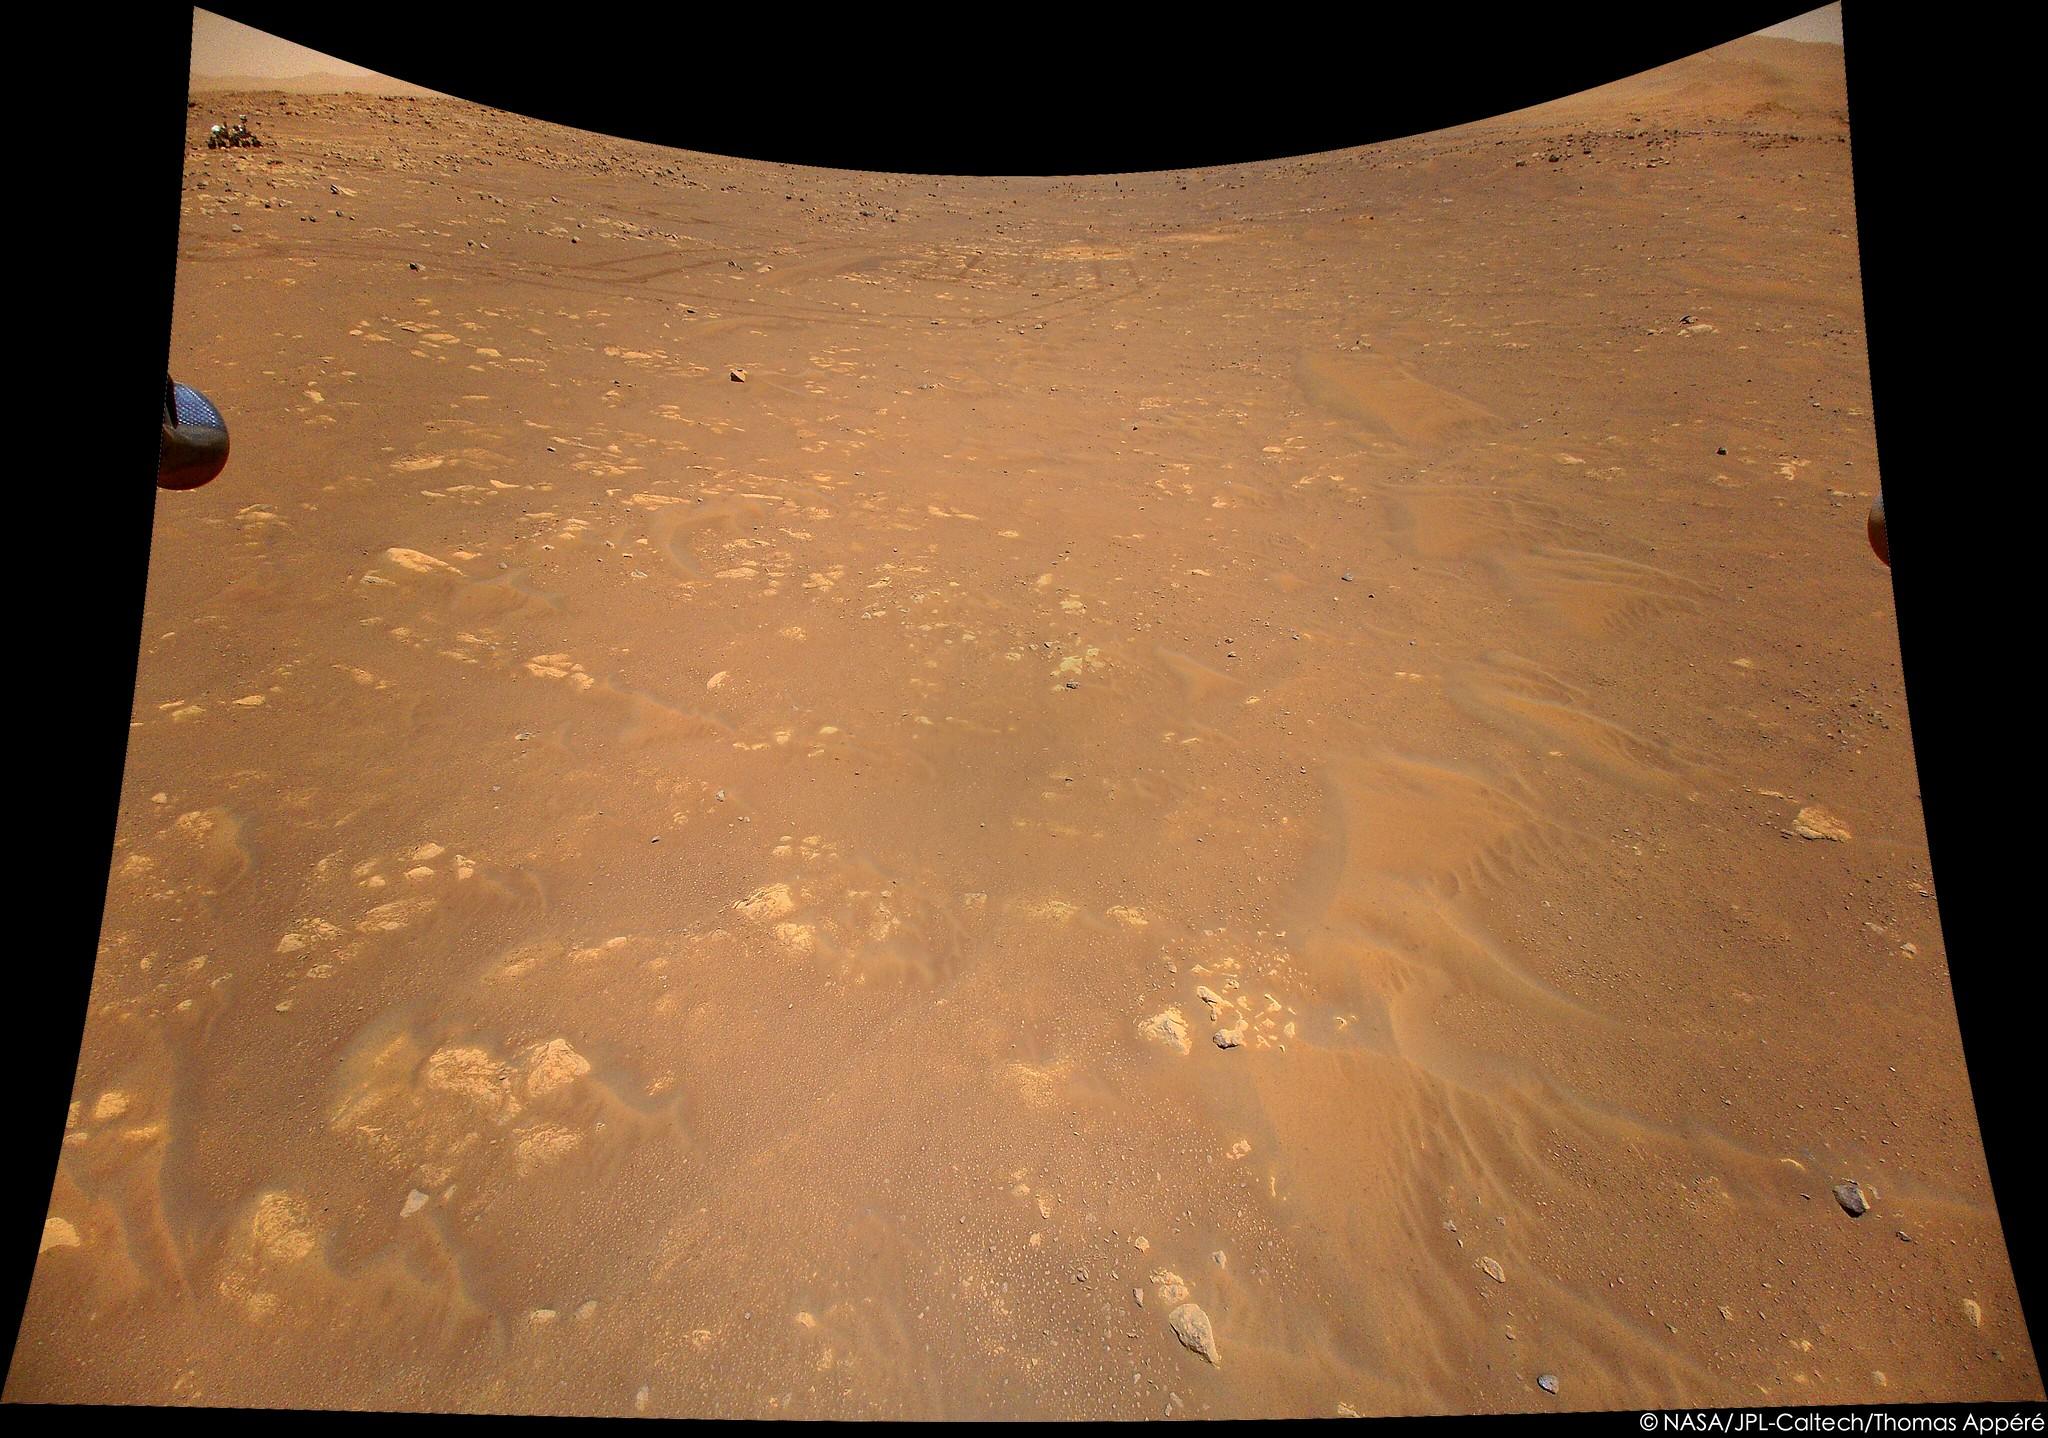 Mars 2020 (Perseverance - Ingenuity) : exploration du cratère Jezero - Page 15 11949